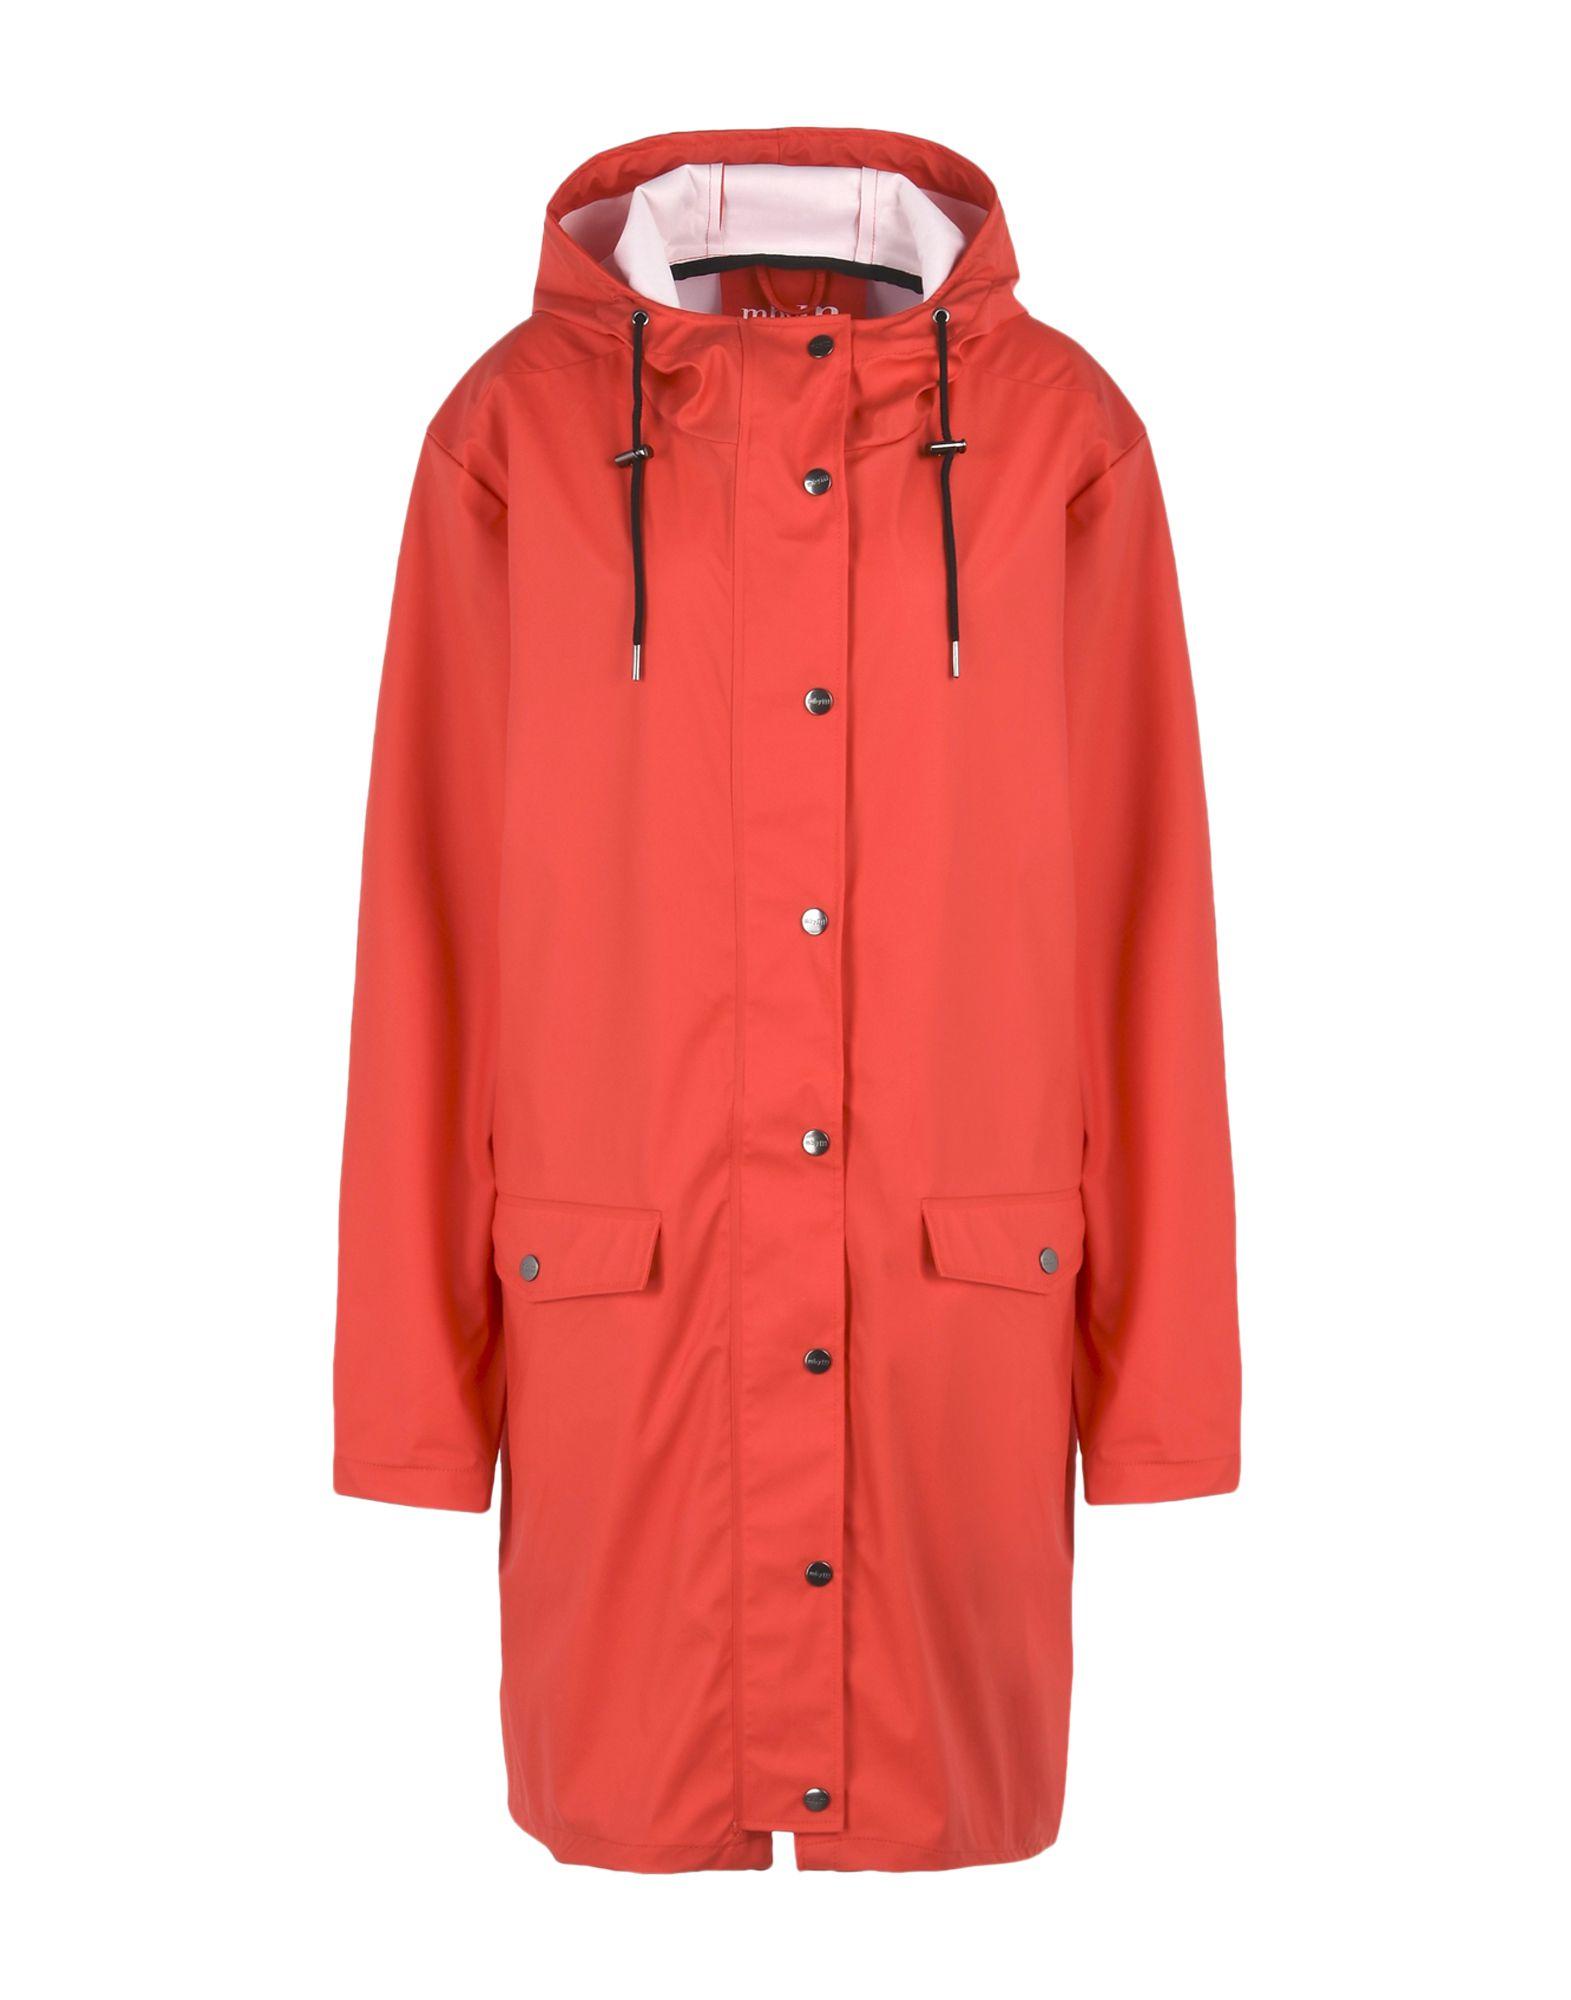 MBYM Full-Length Jacket in Red